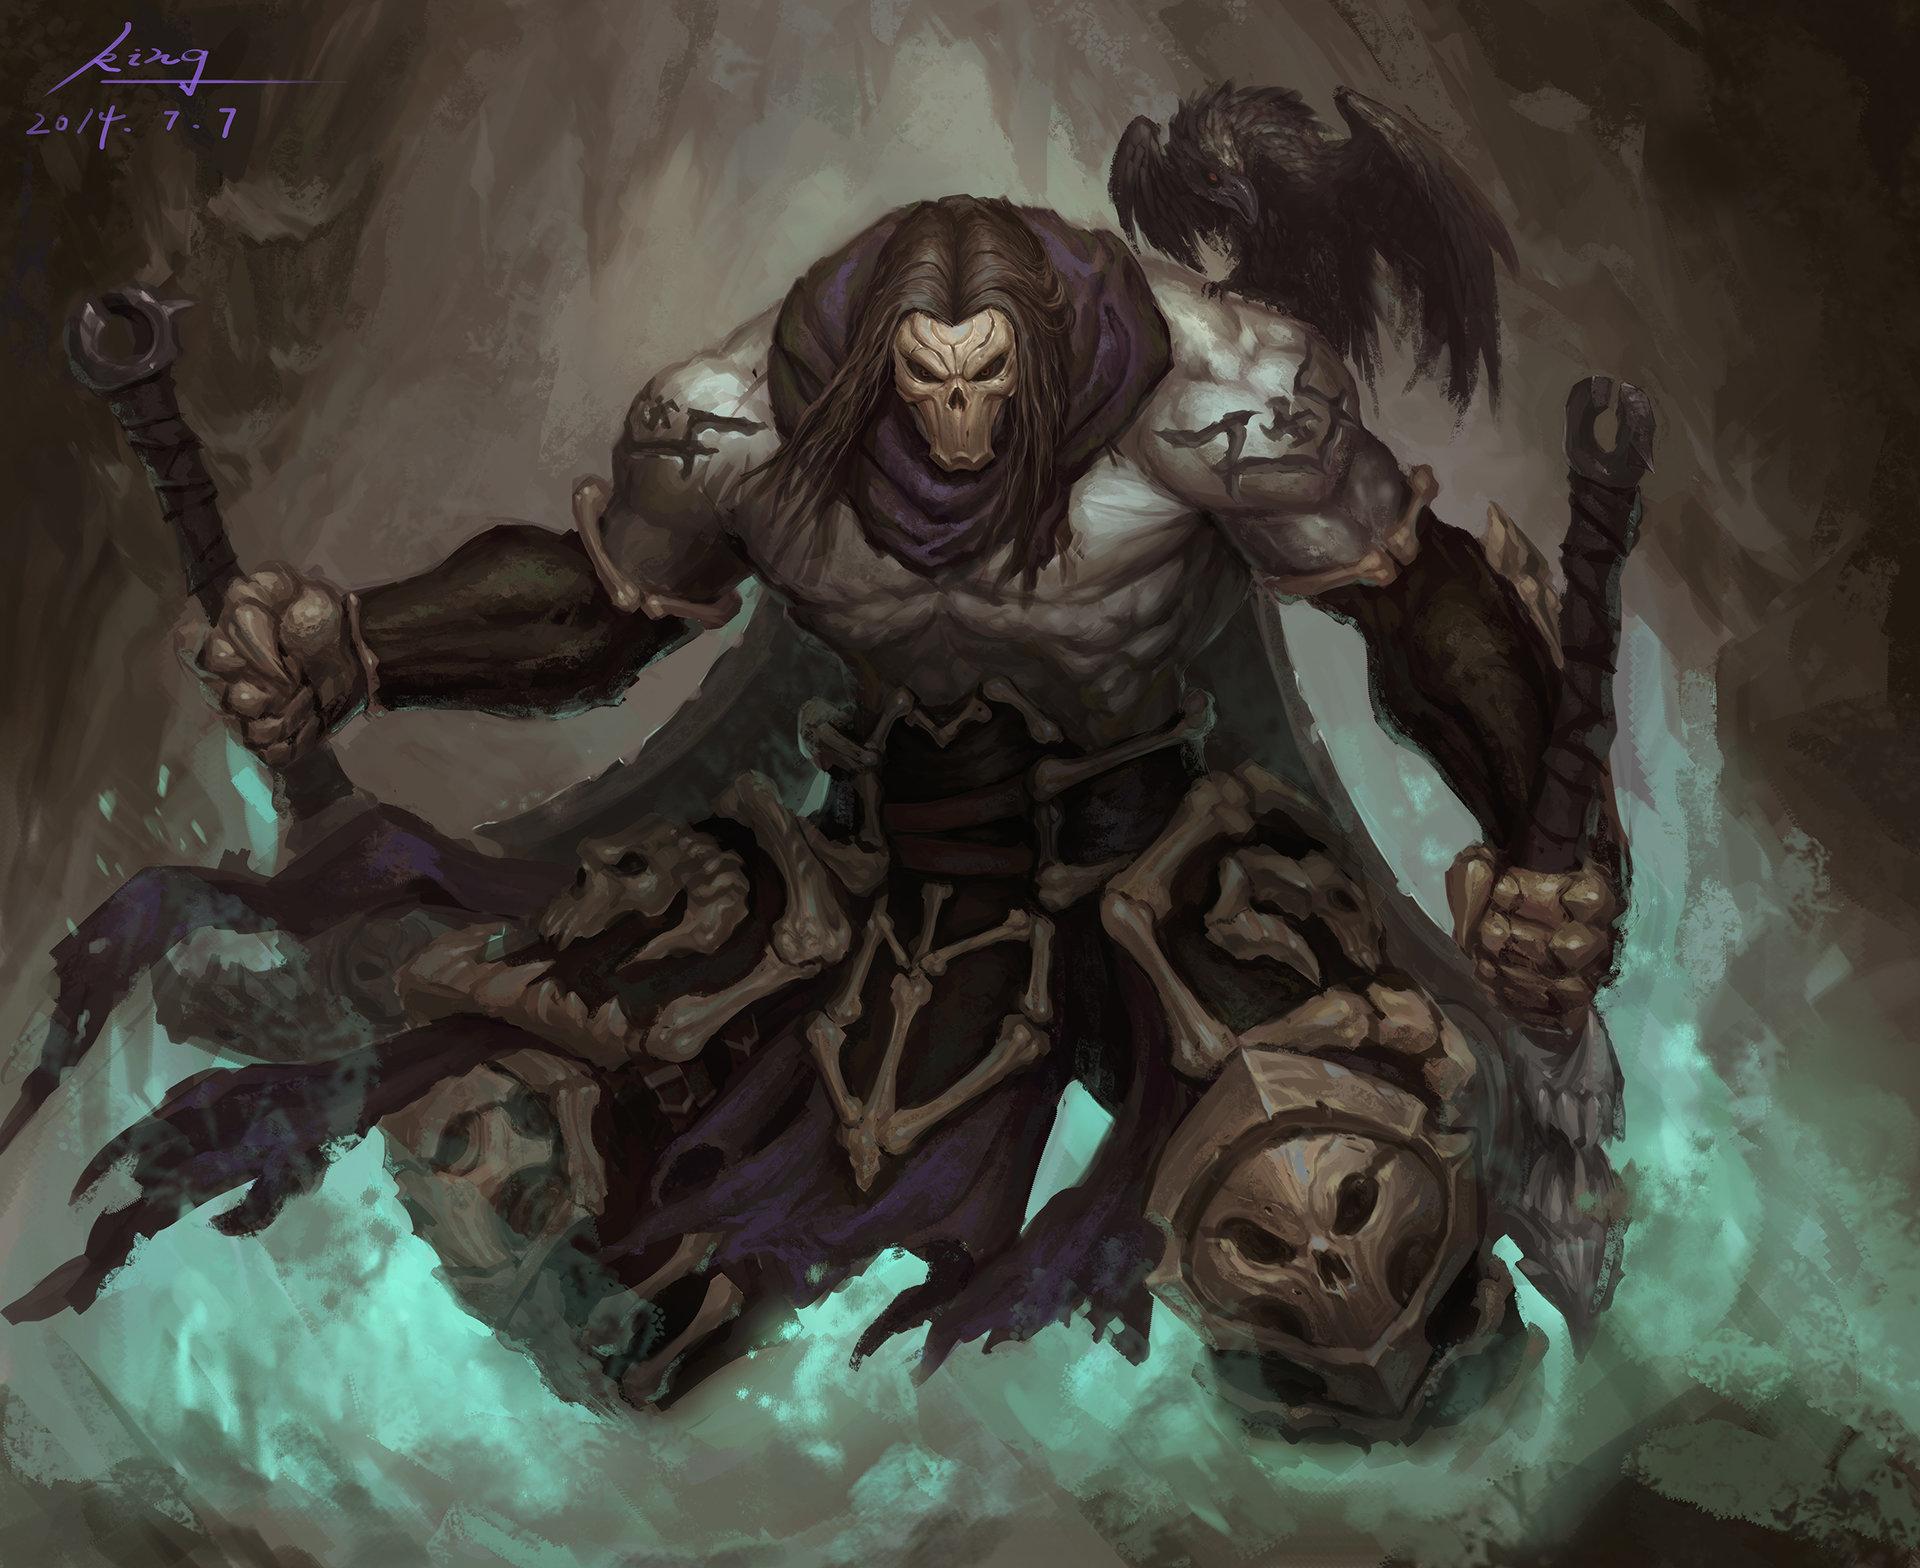 Death In Darksiders 2 Wallpaper Hd Games 4k Wallpapers